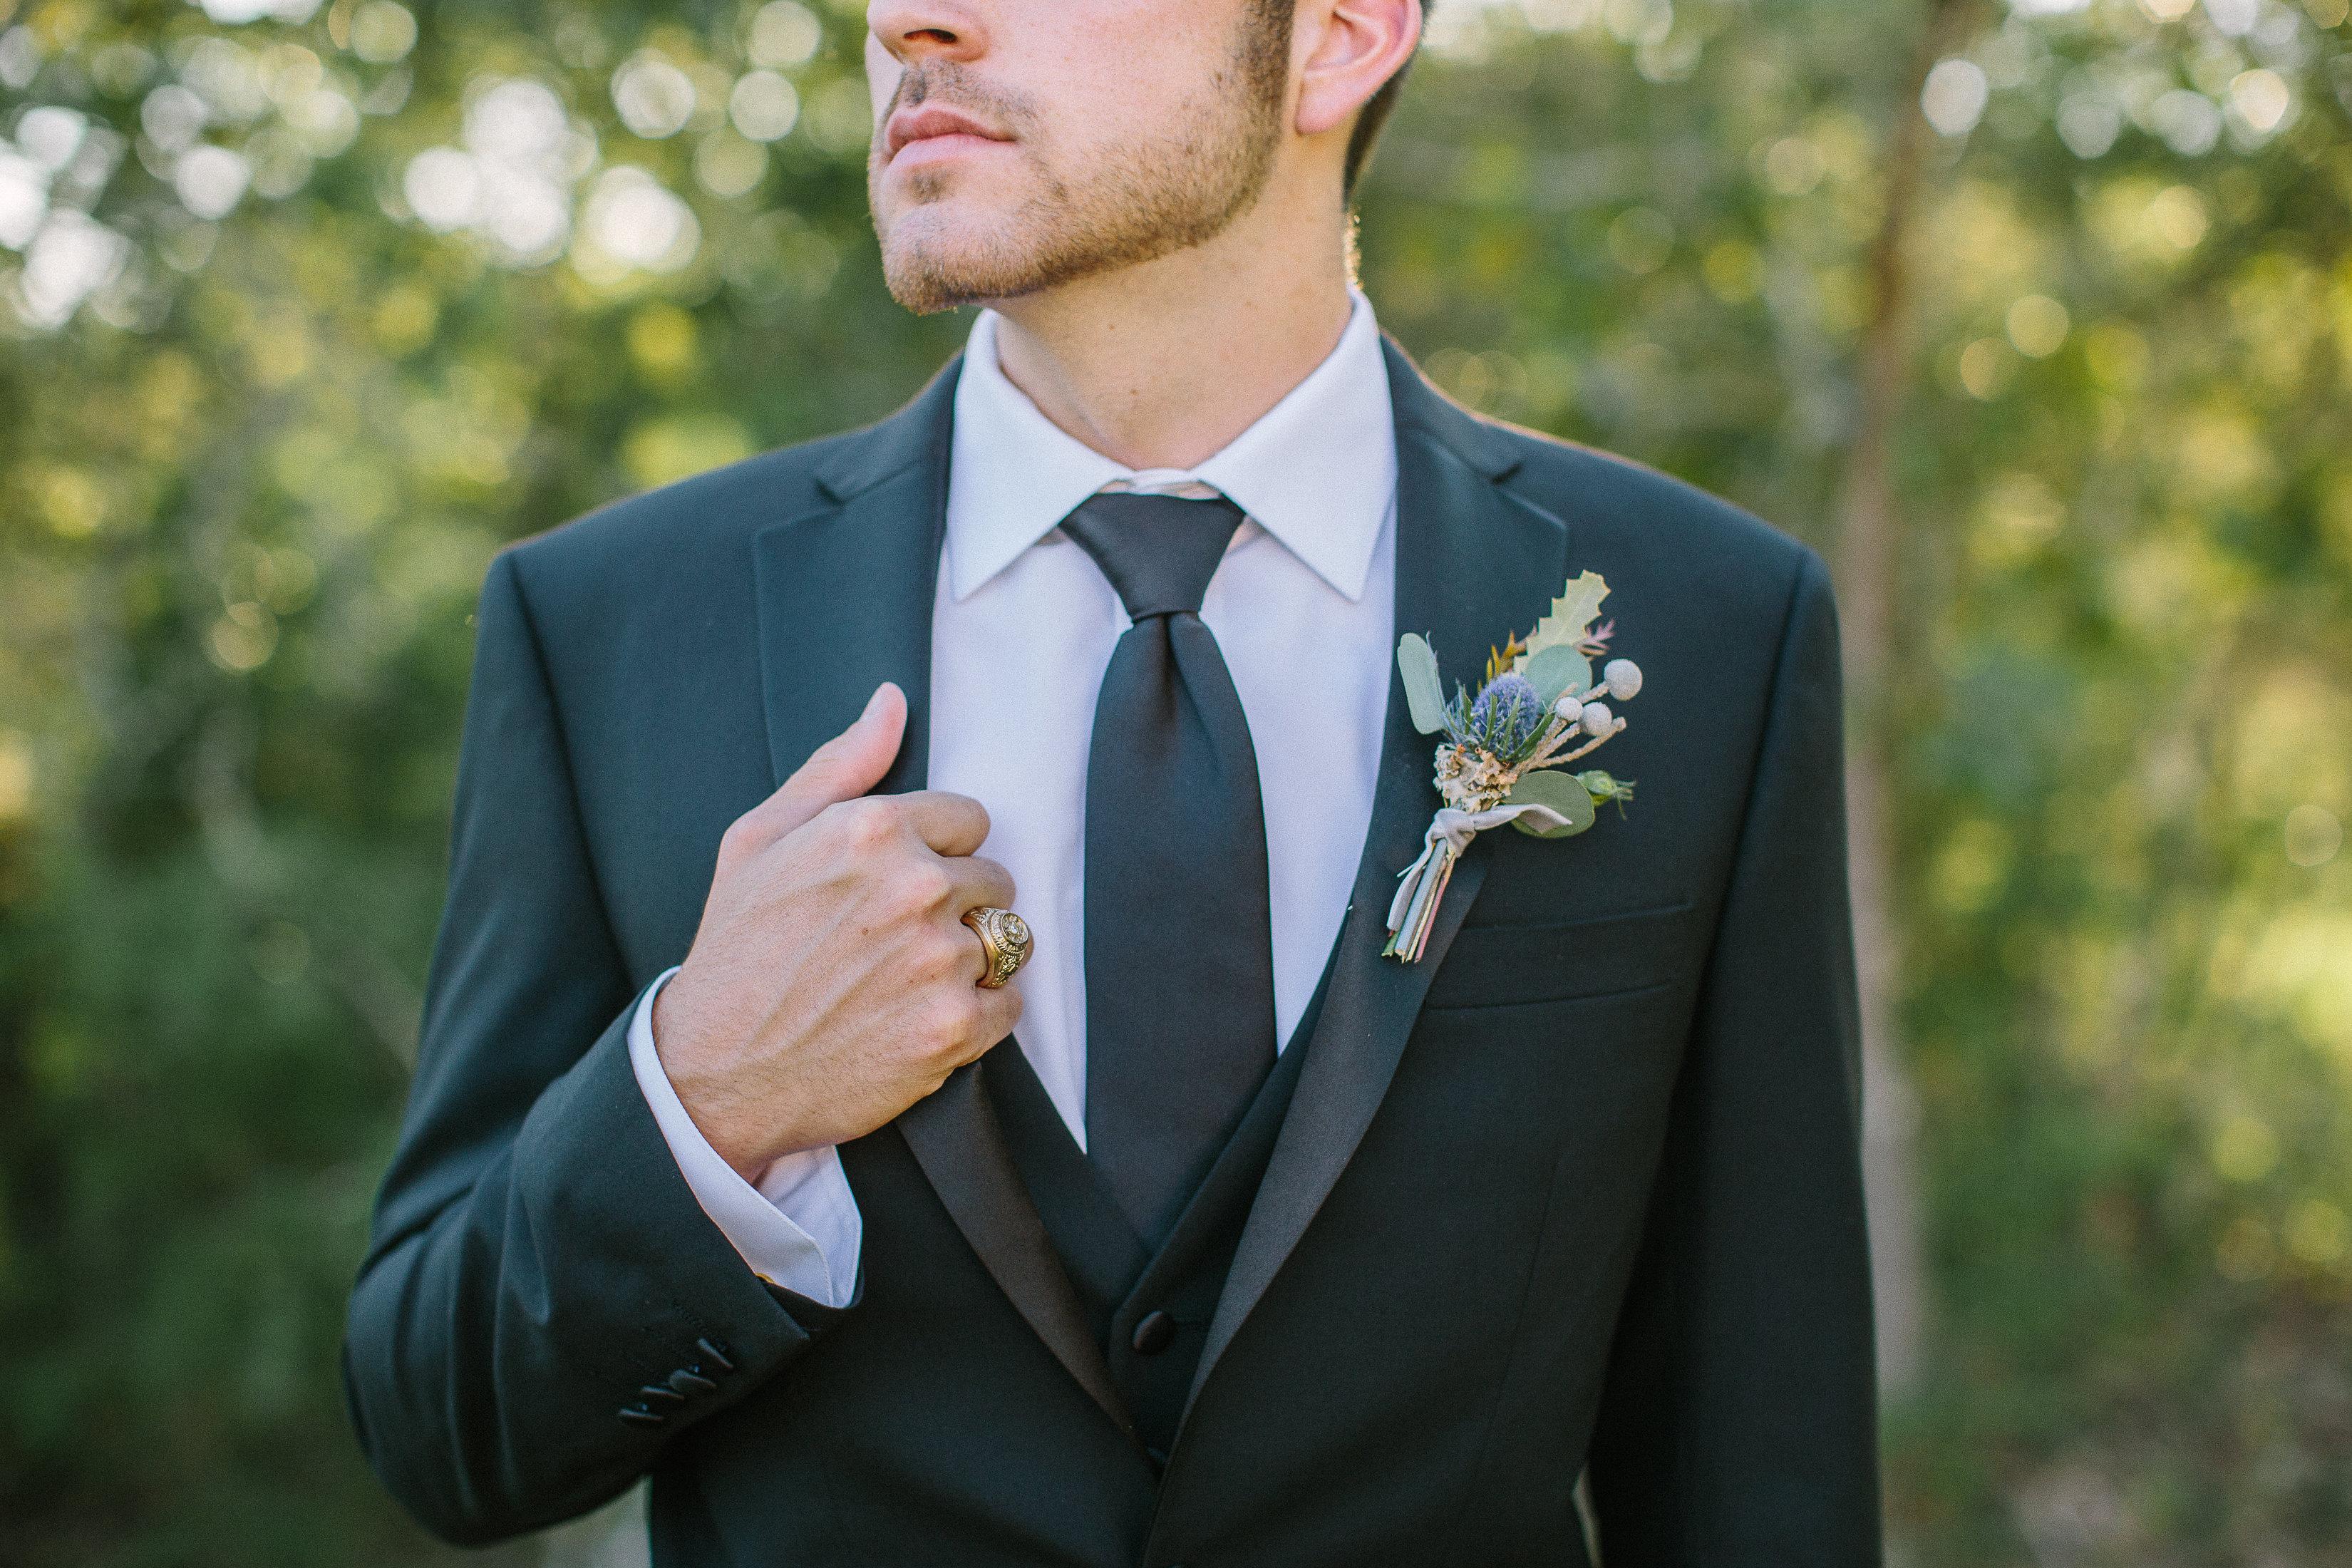 Ellen-Ashton-Photography-Peach-Creek-Ranch-Weddings-Wed-and-Prosper207